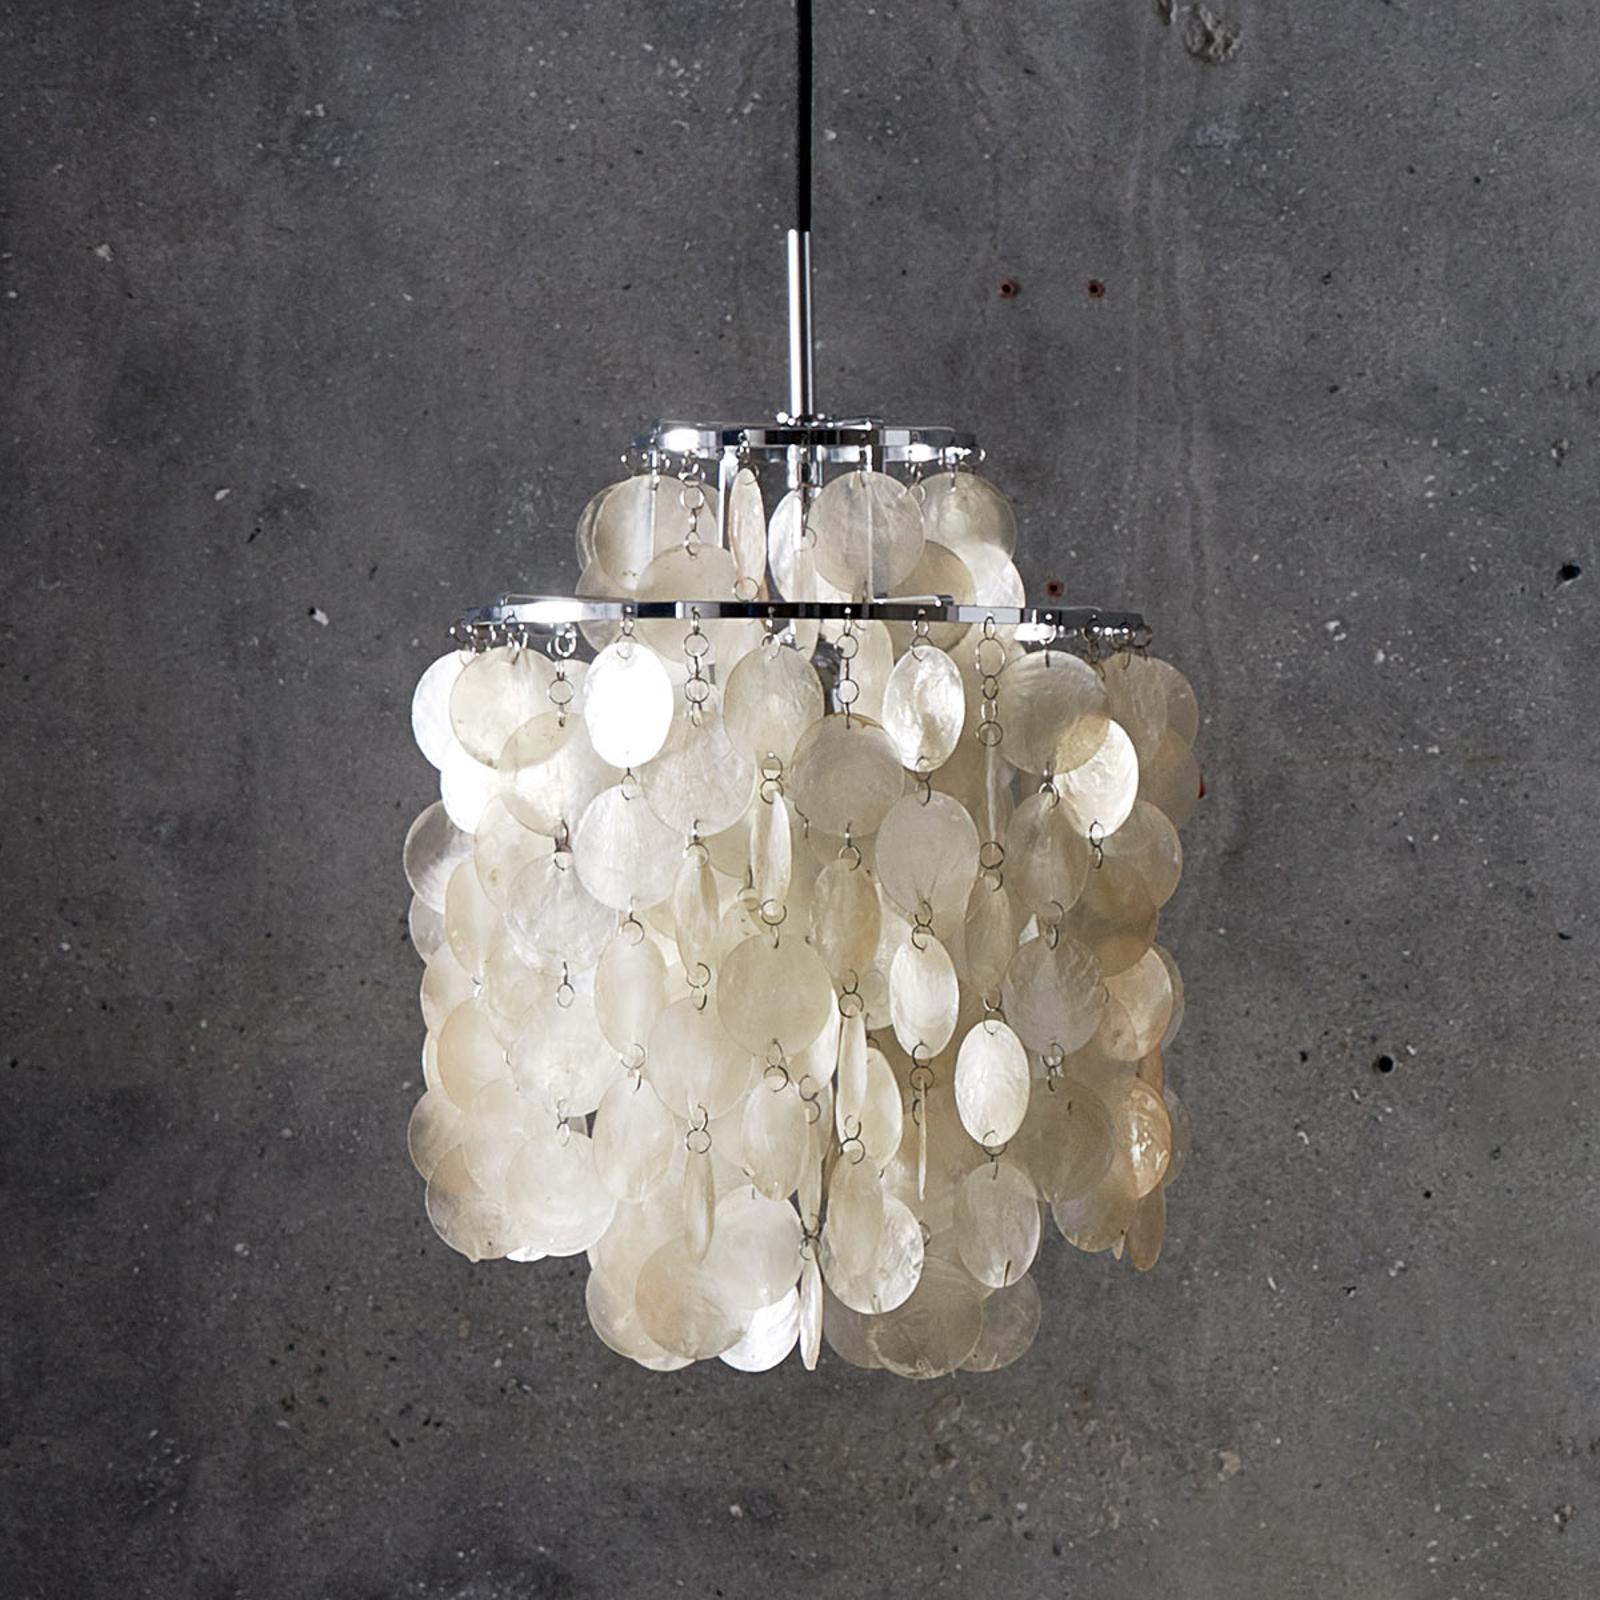 VERPAN Fun 2DM - effectieve parelmoer hanglamp